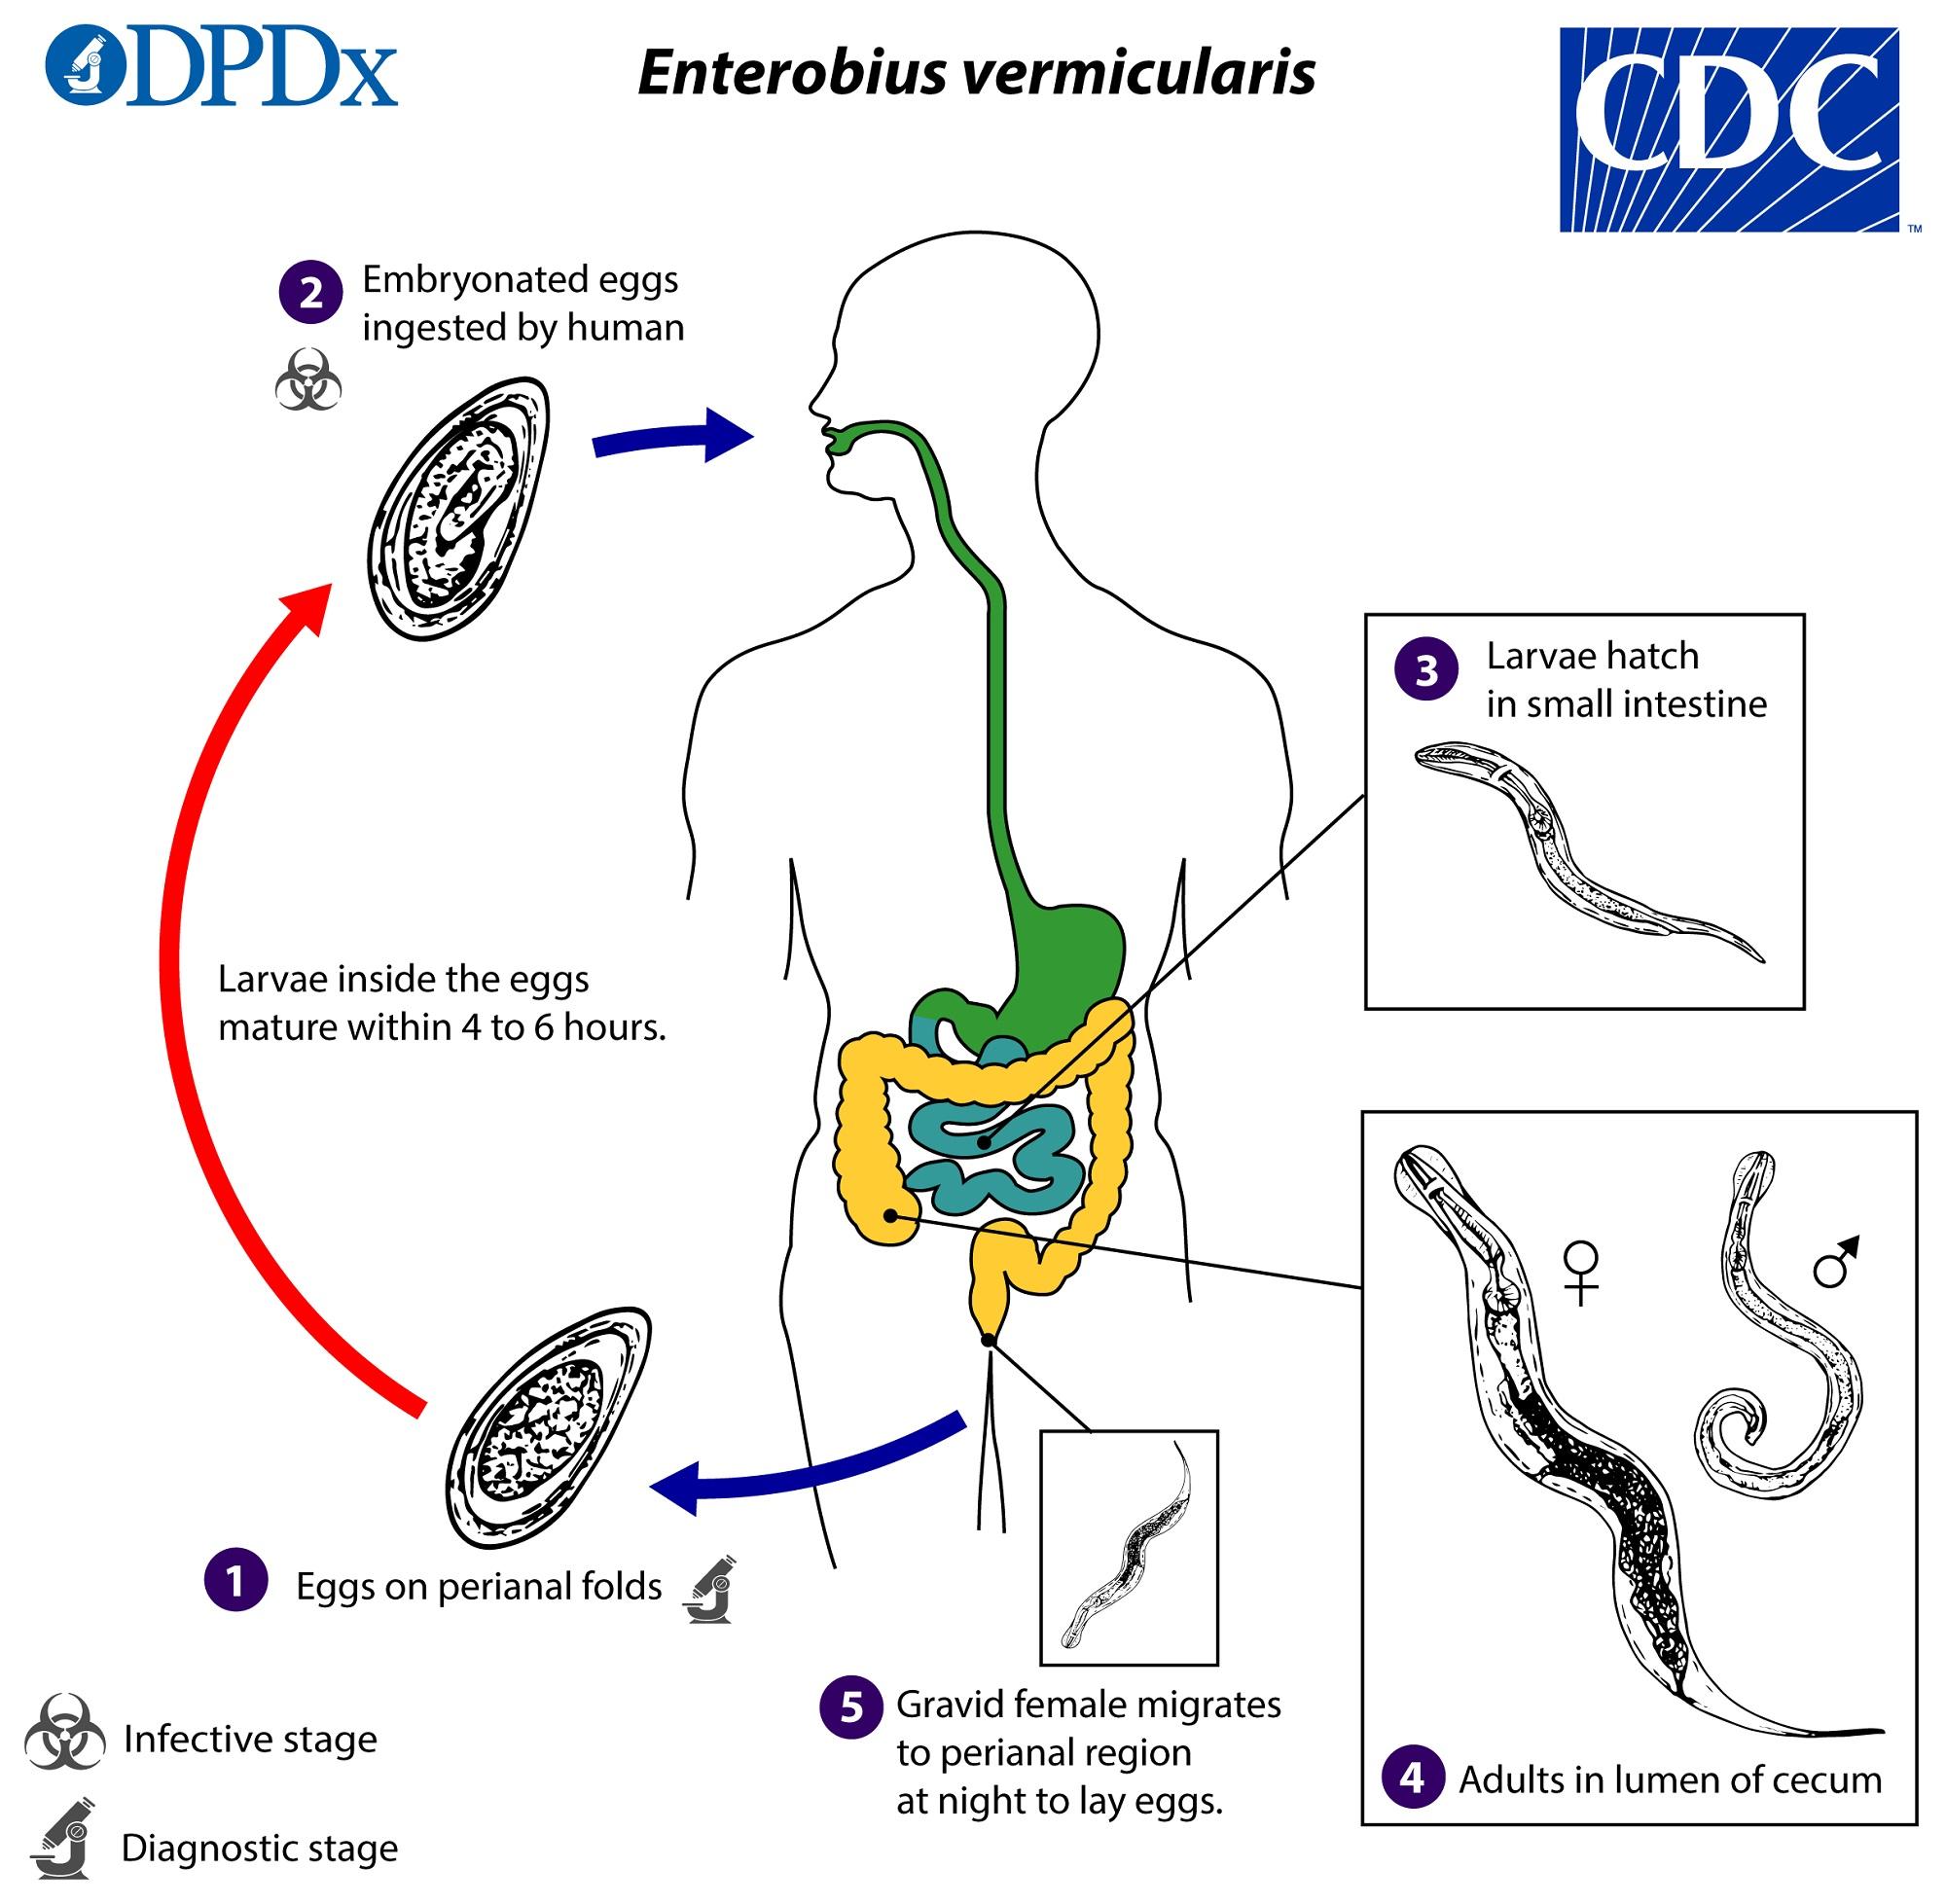 Enterobiasis terápia - Bélféreg: okok, tünetek, kezelés, Enterobiosis mi az, Enterobiasis terápia